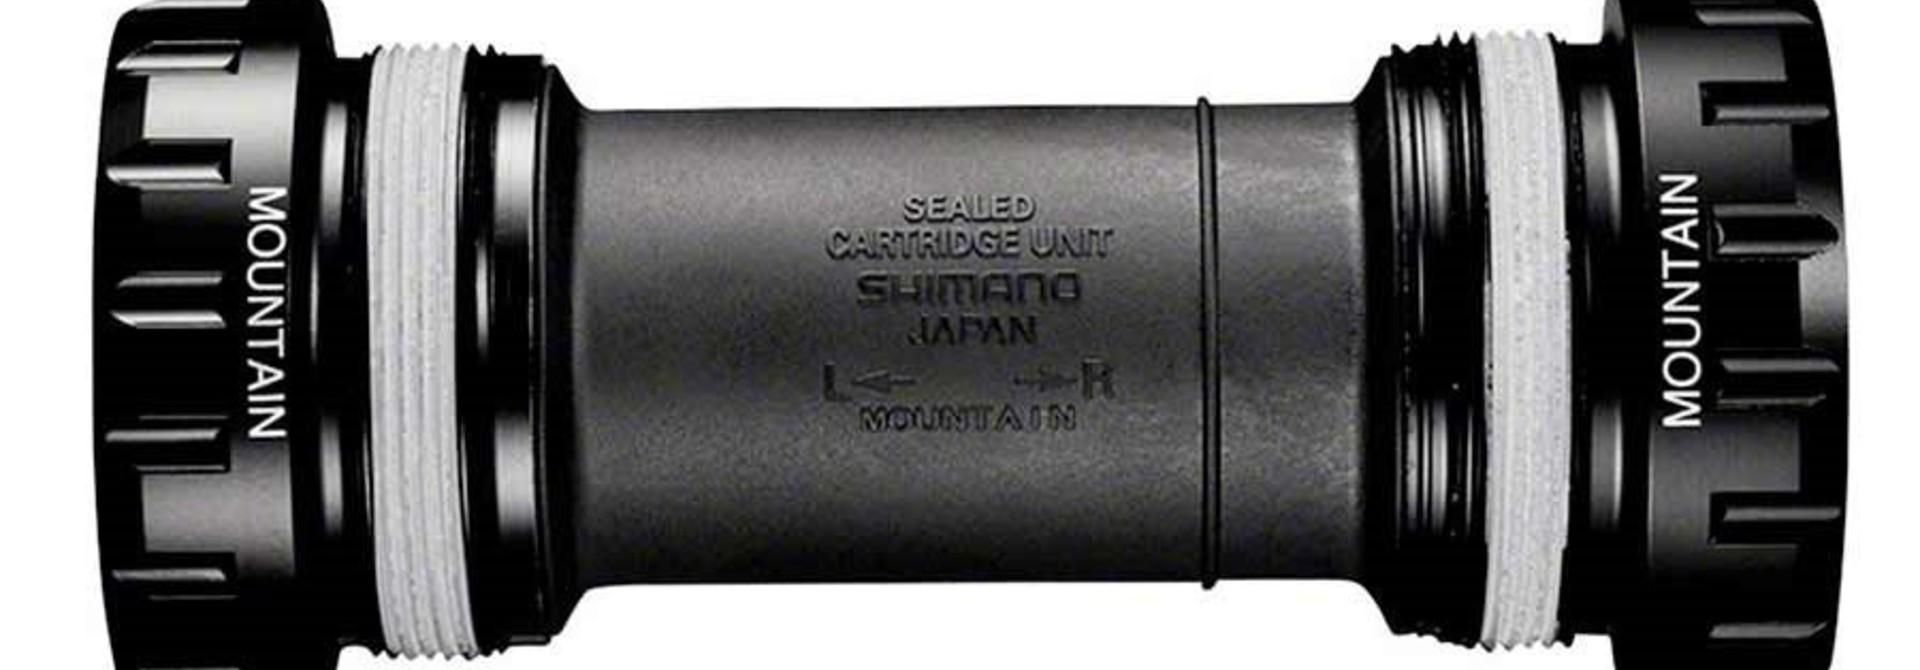 Shimano, XT BB-MT800, Hollowtech II, BB Shell: 68/73mm, Steel Black, IBBMT800B